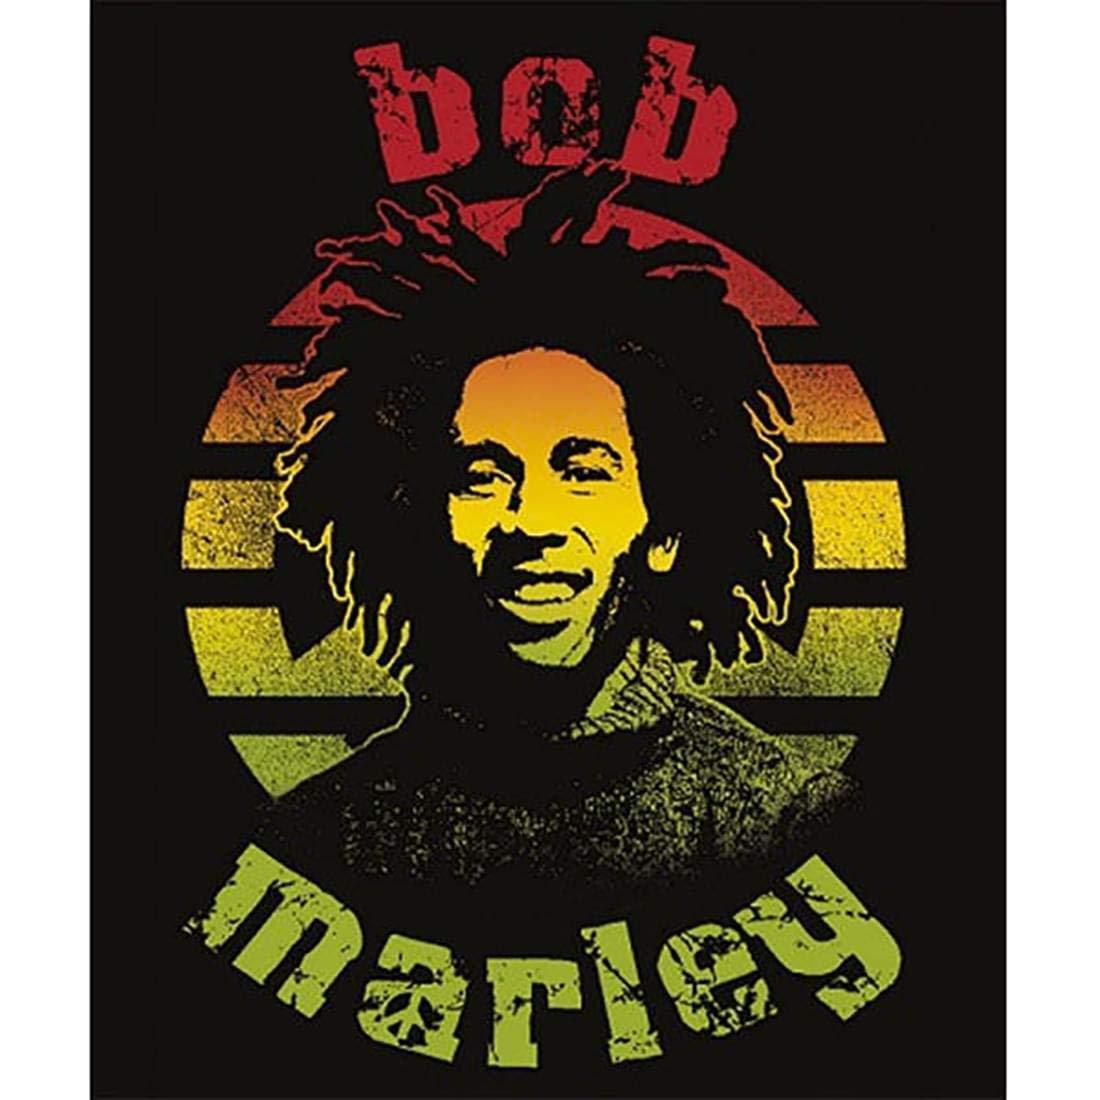 JUST FUNKY Bob Marley Face Blanket BOB-BL-4760-JFC